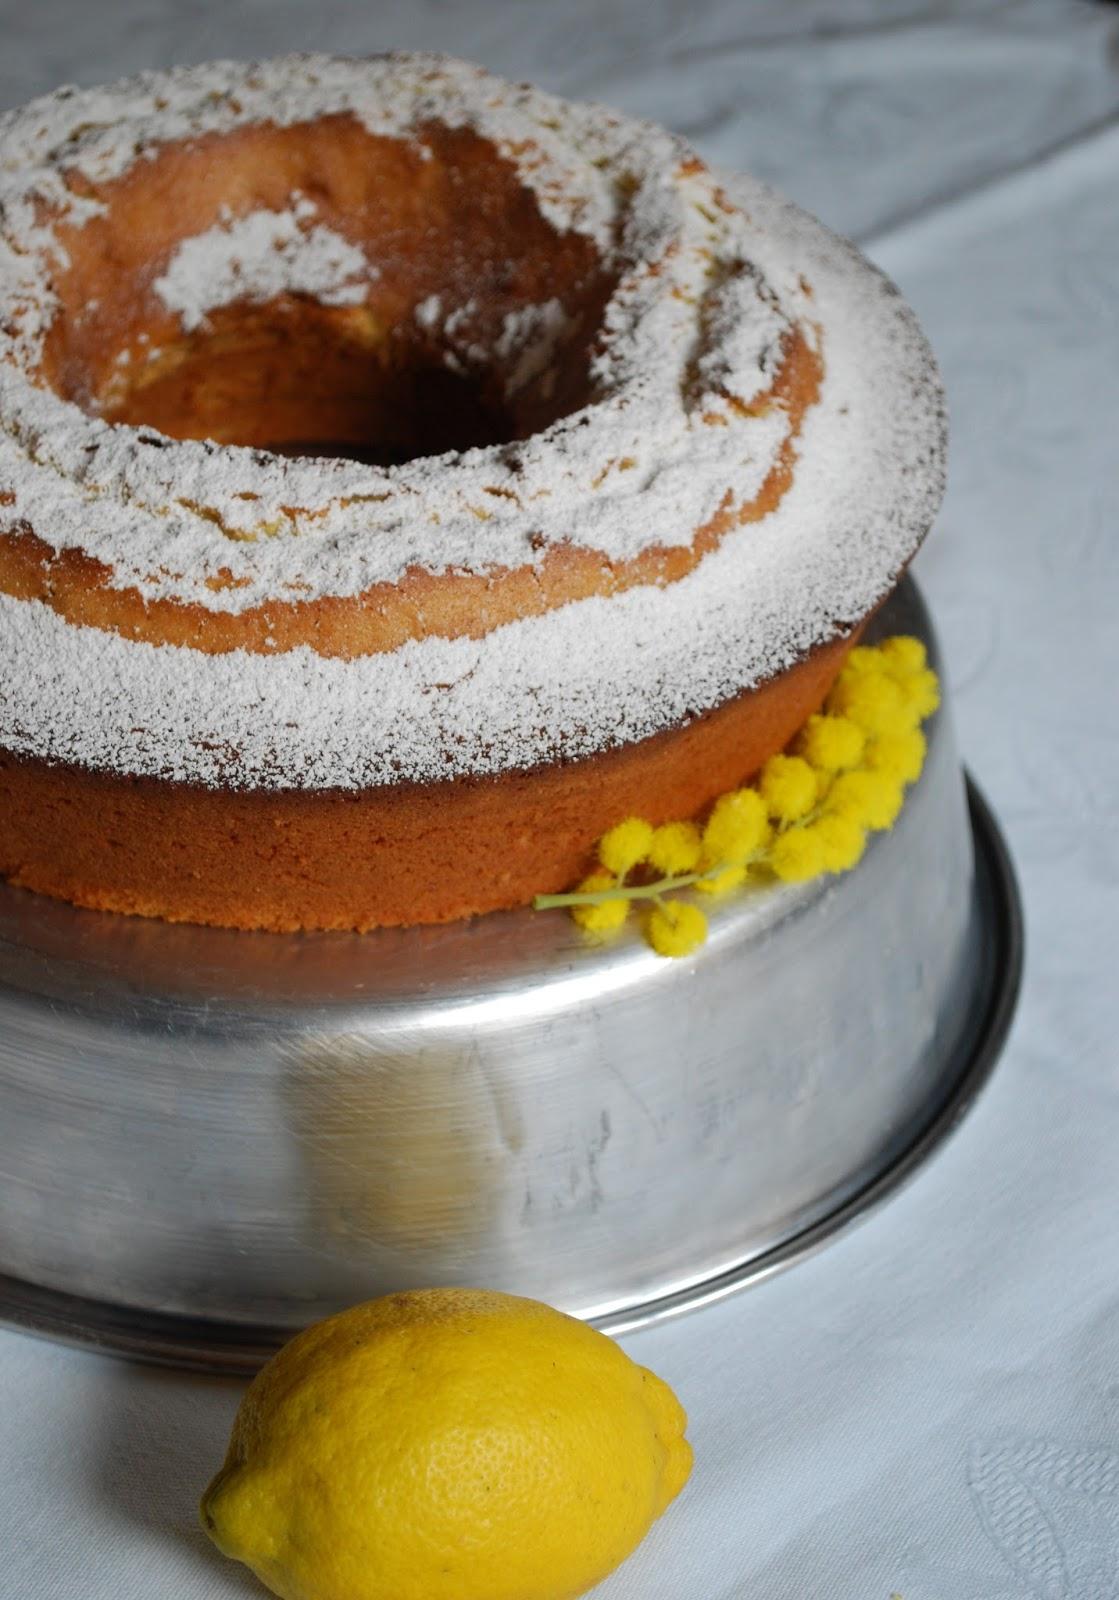 torta all'olio extravergine d'oliva, limone e rosmarino